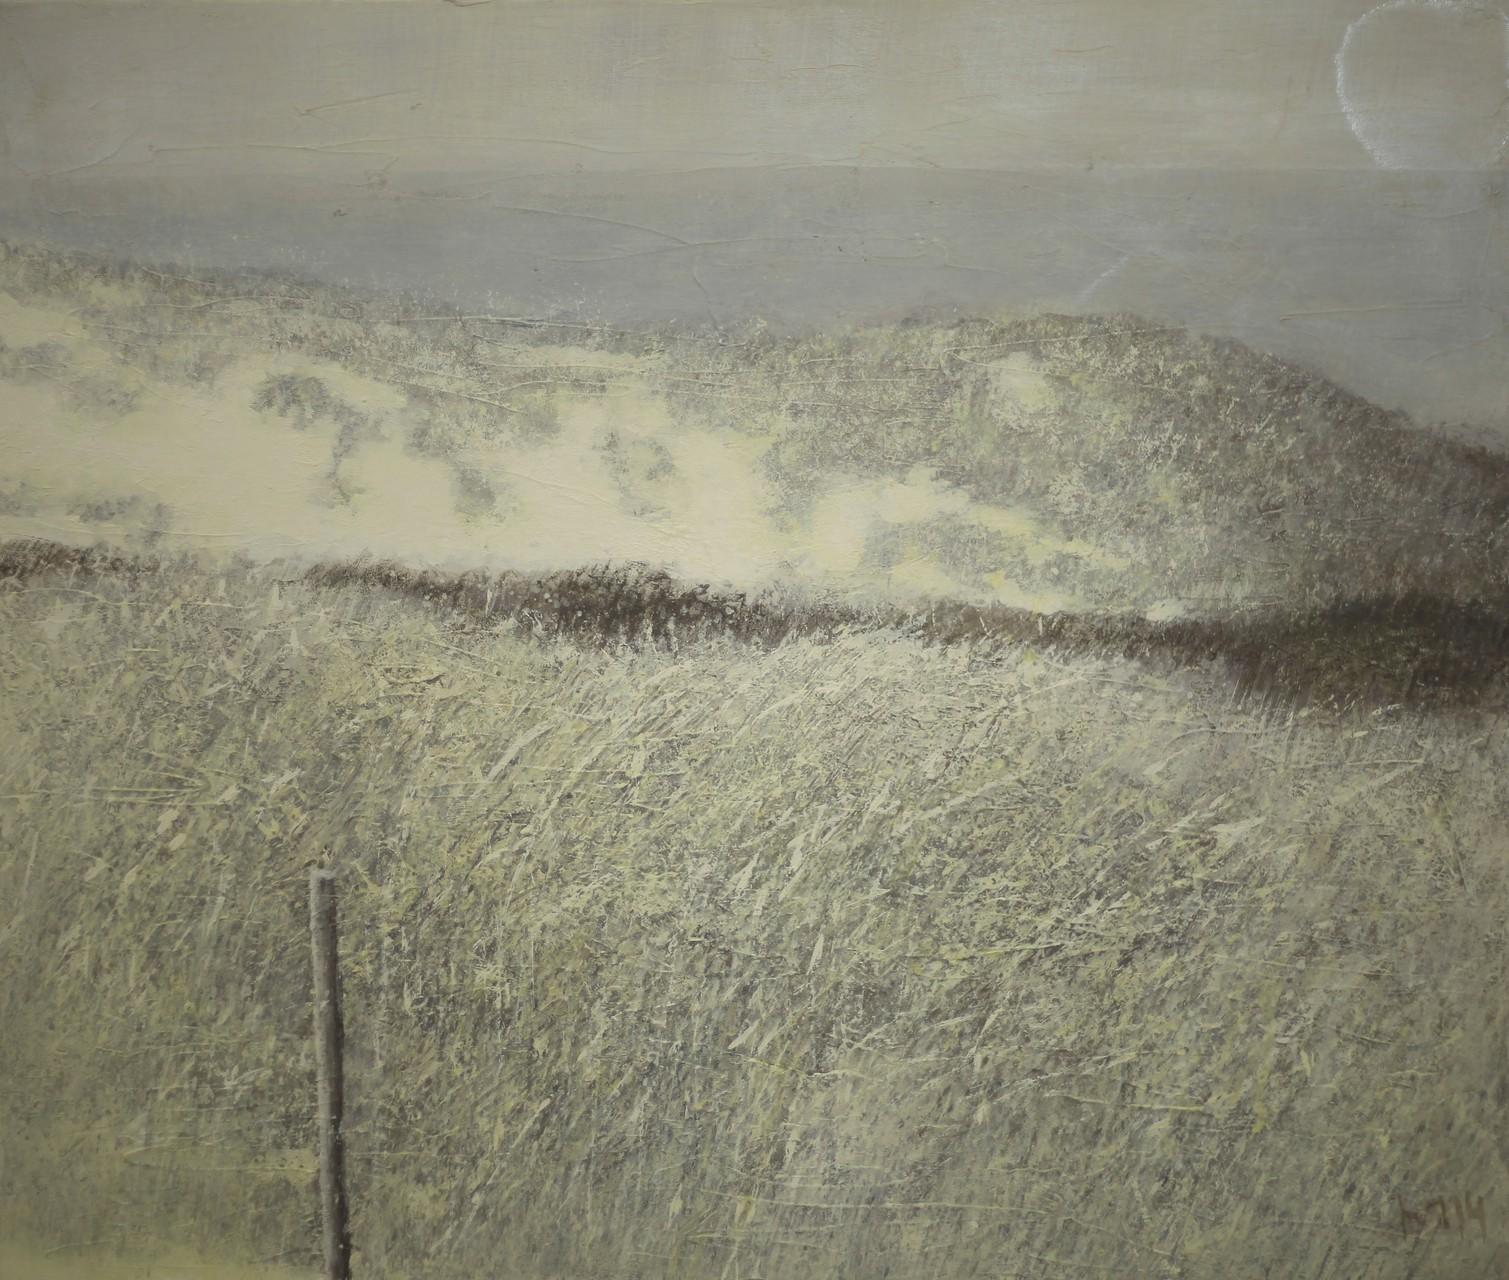 Ю. Первушин.       Zeeland.    Domburg. № 6.     2014 г.     Холст, акрил.     60х70 см.